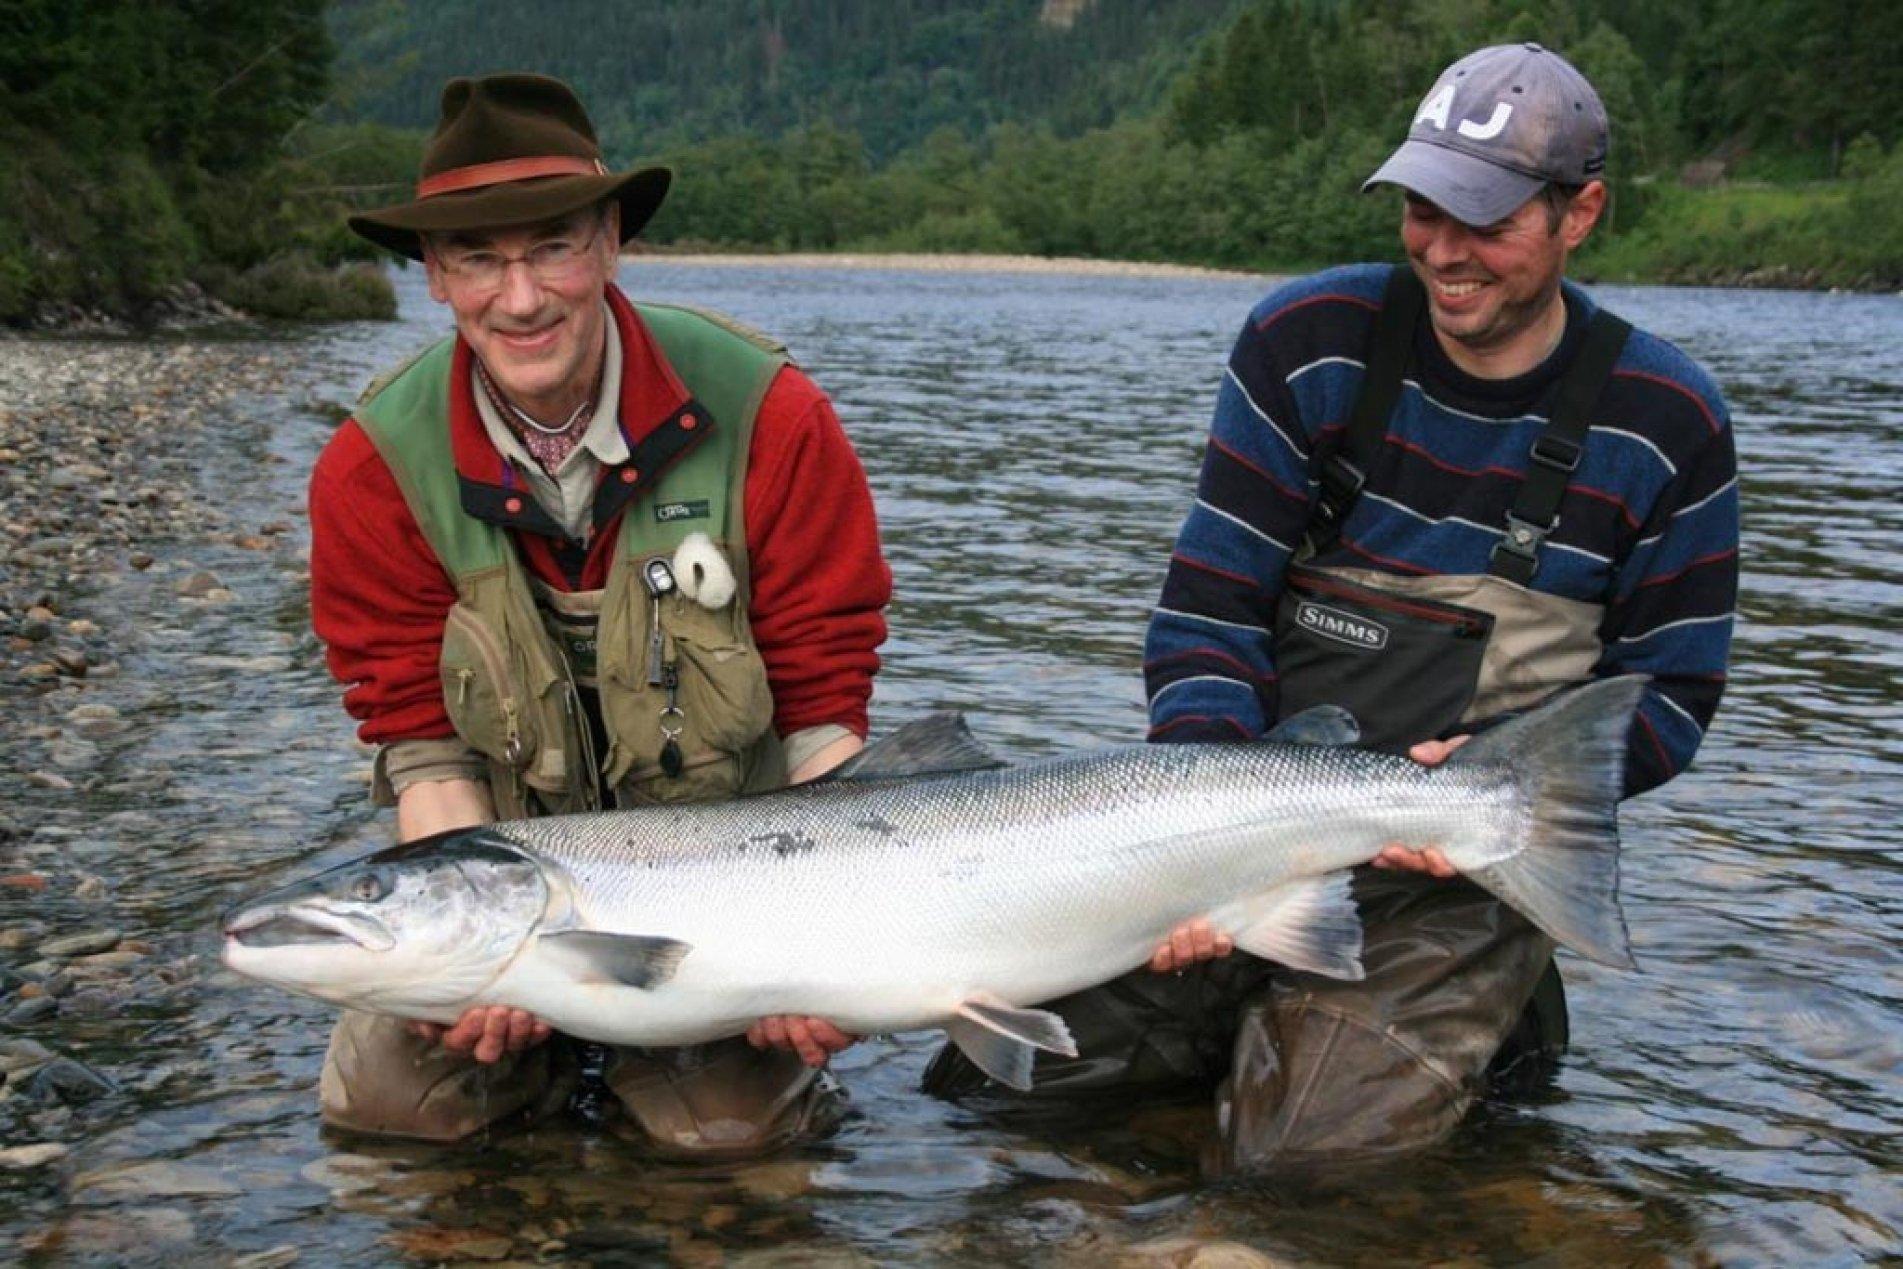 salmon fishermen in norway with huge salmon